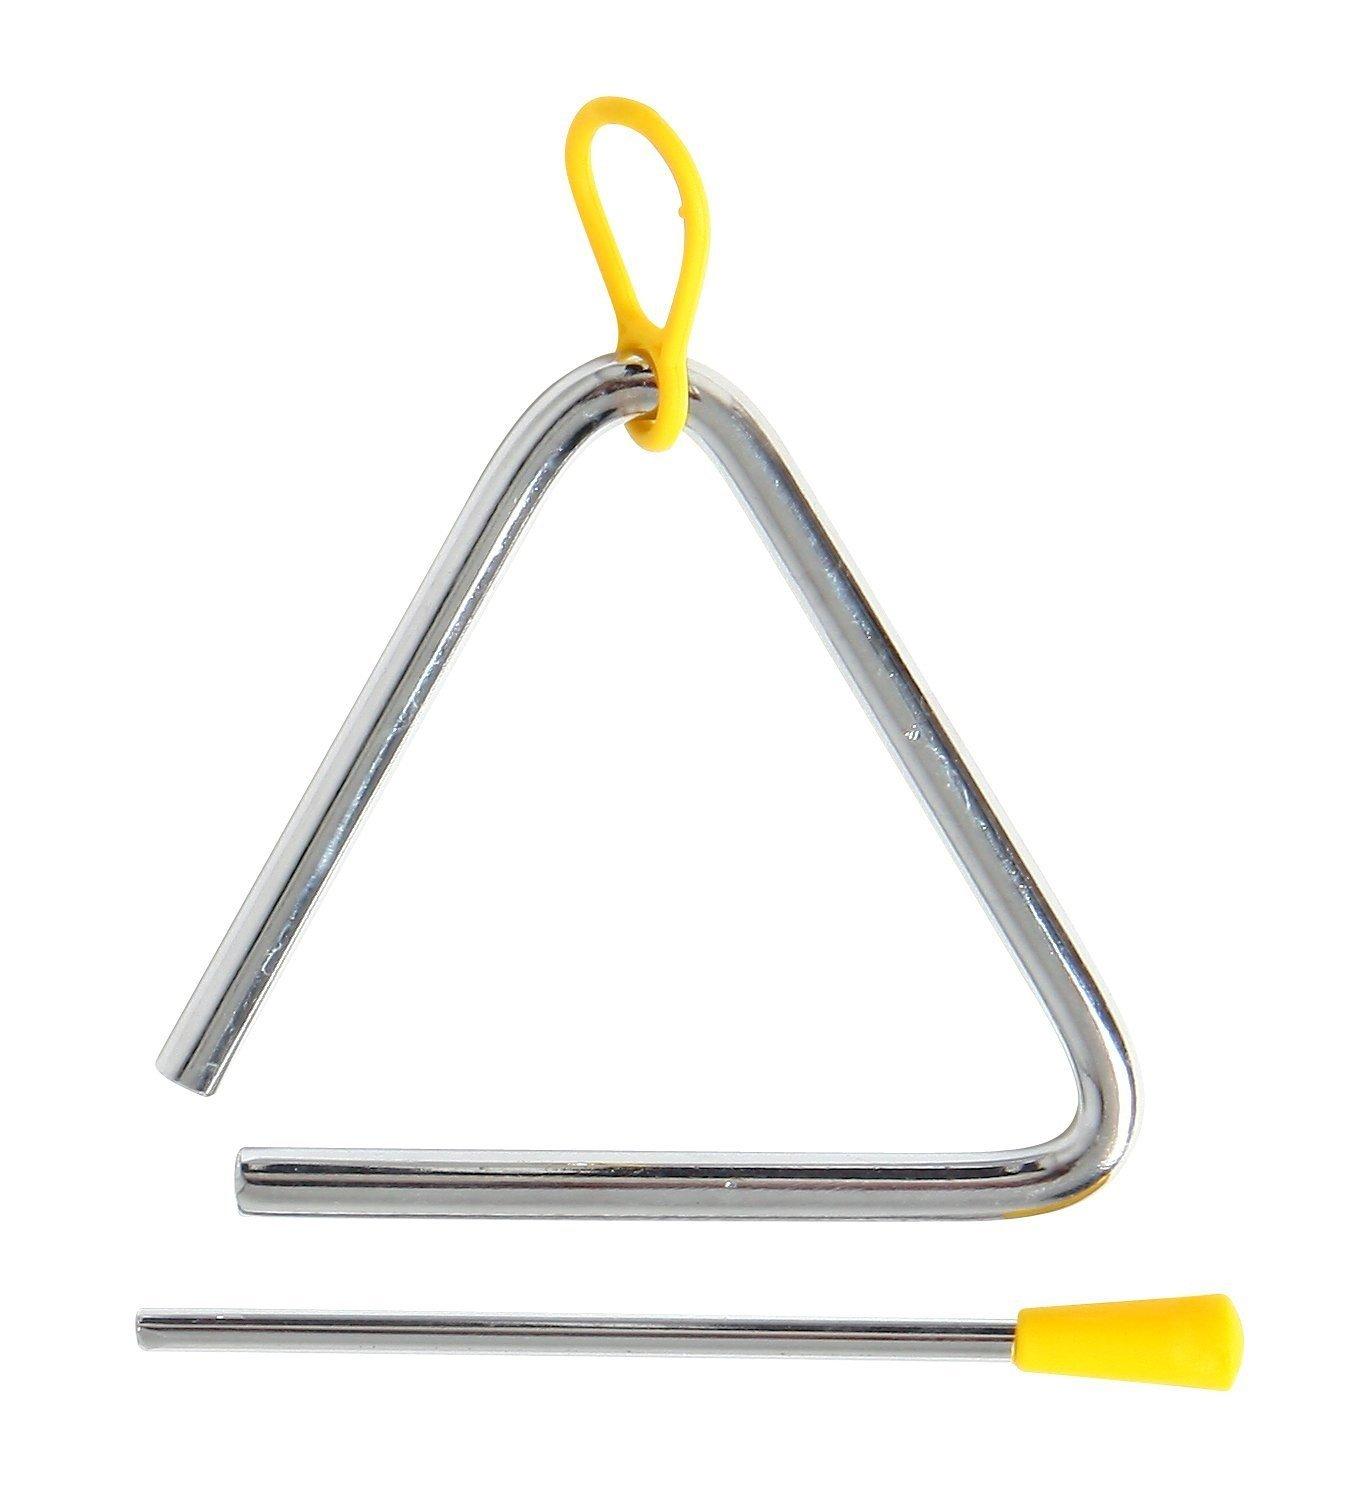 Wicemoon enfants Instruments de musique Percusion Instrument musicales Triangle musical, musique Triangle Triangle de percussion Instrument de musique